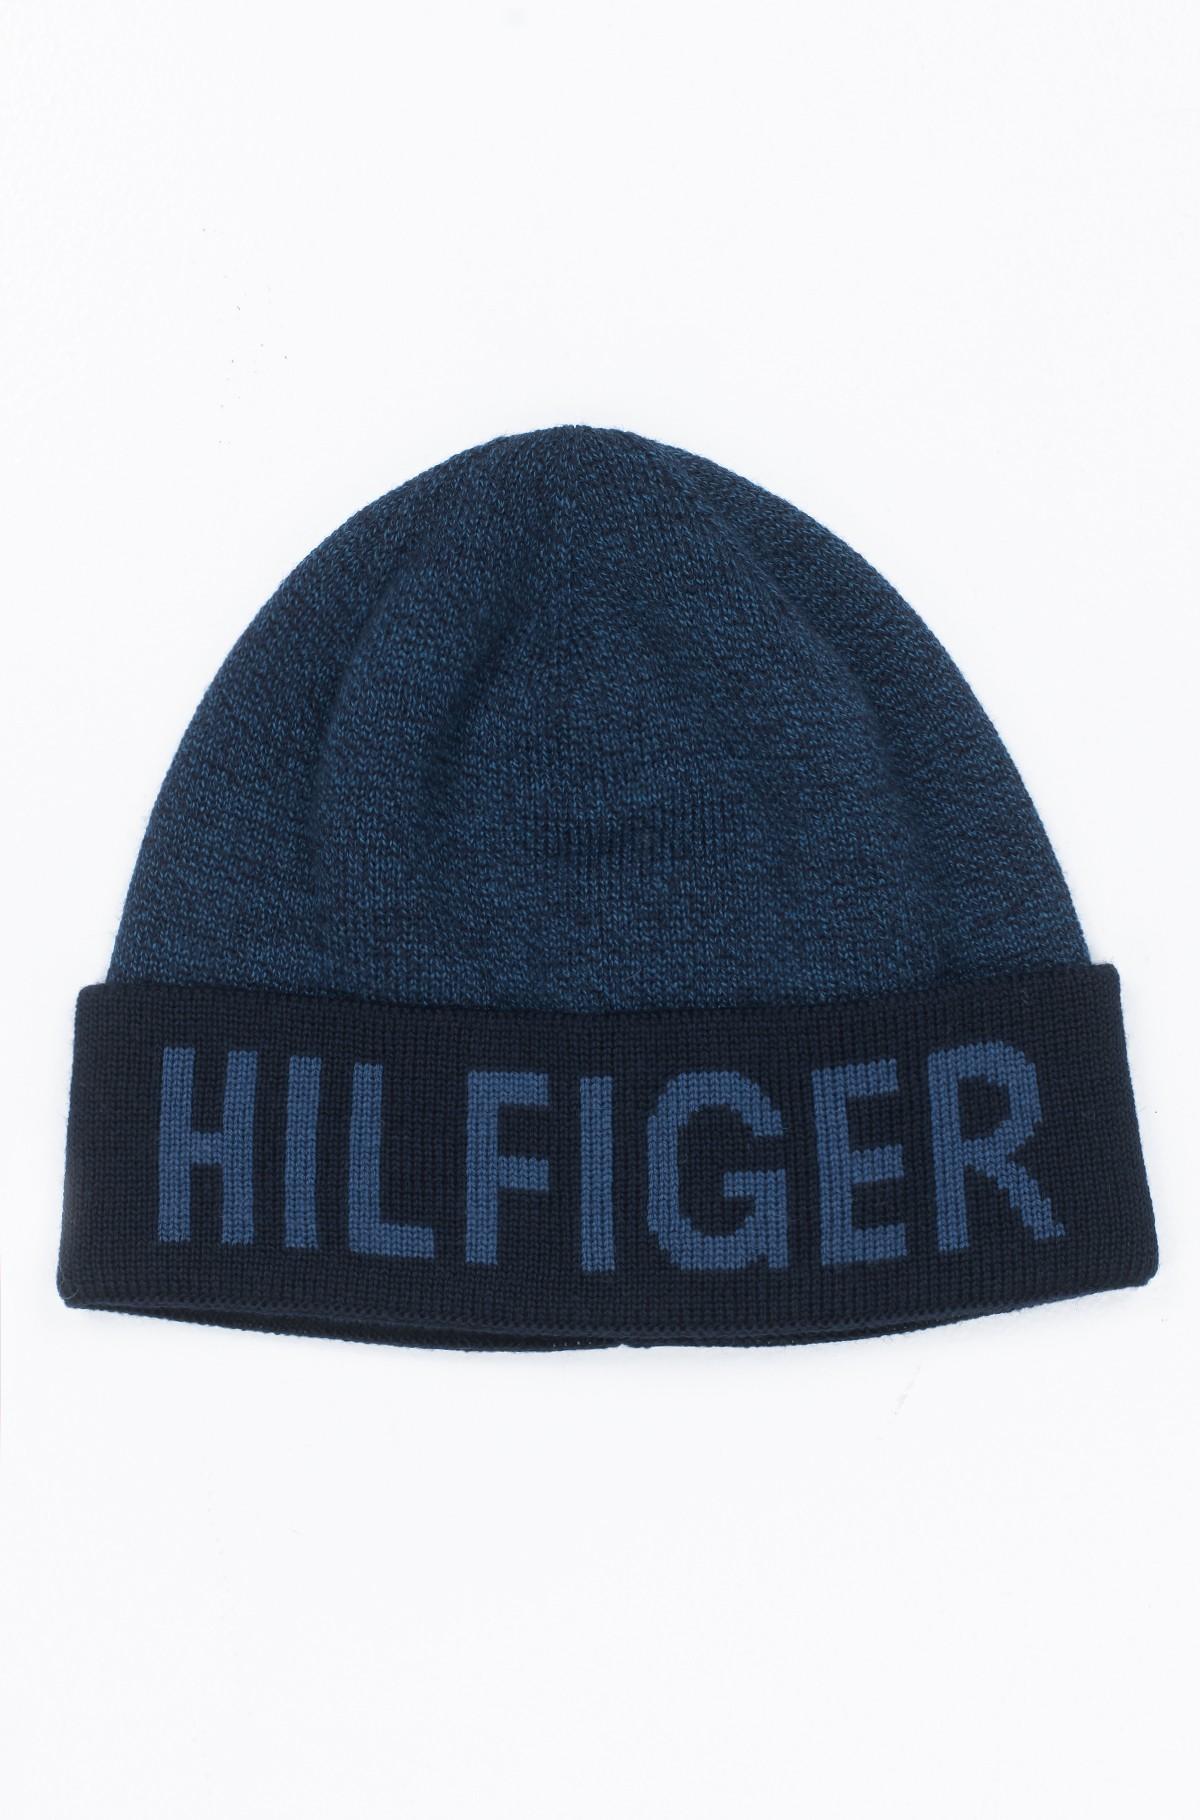 Kepurė HILFIGER SELVEDGE BEANIE-full-1